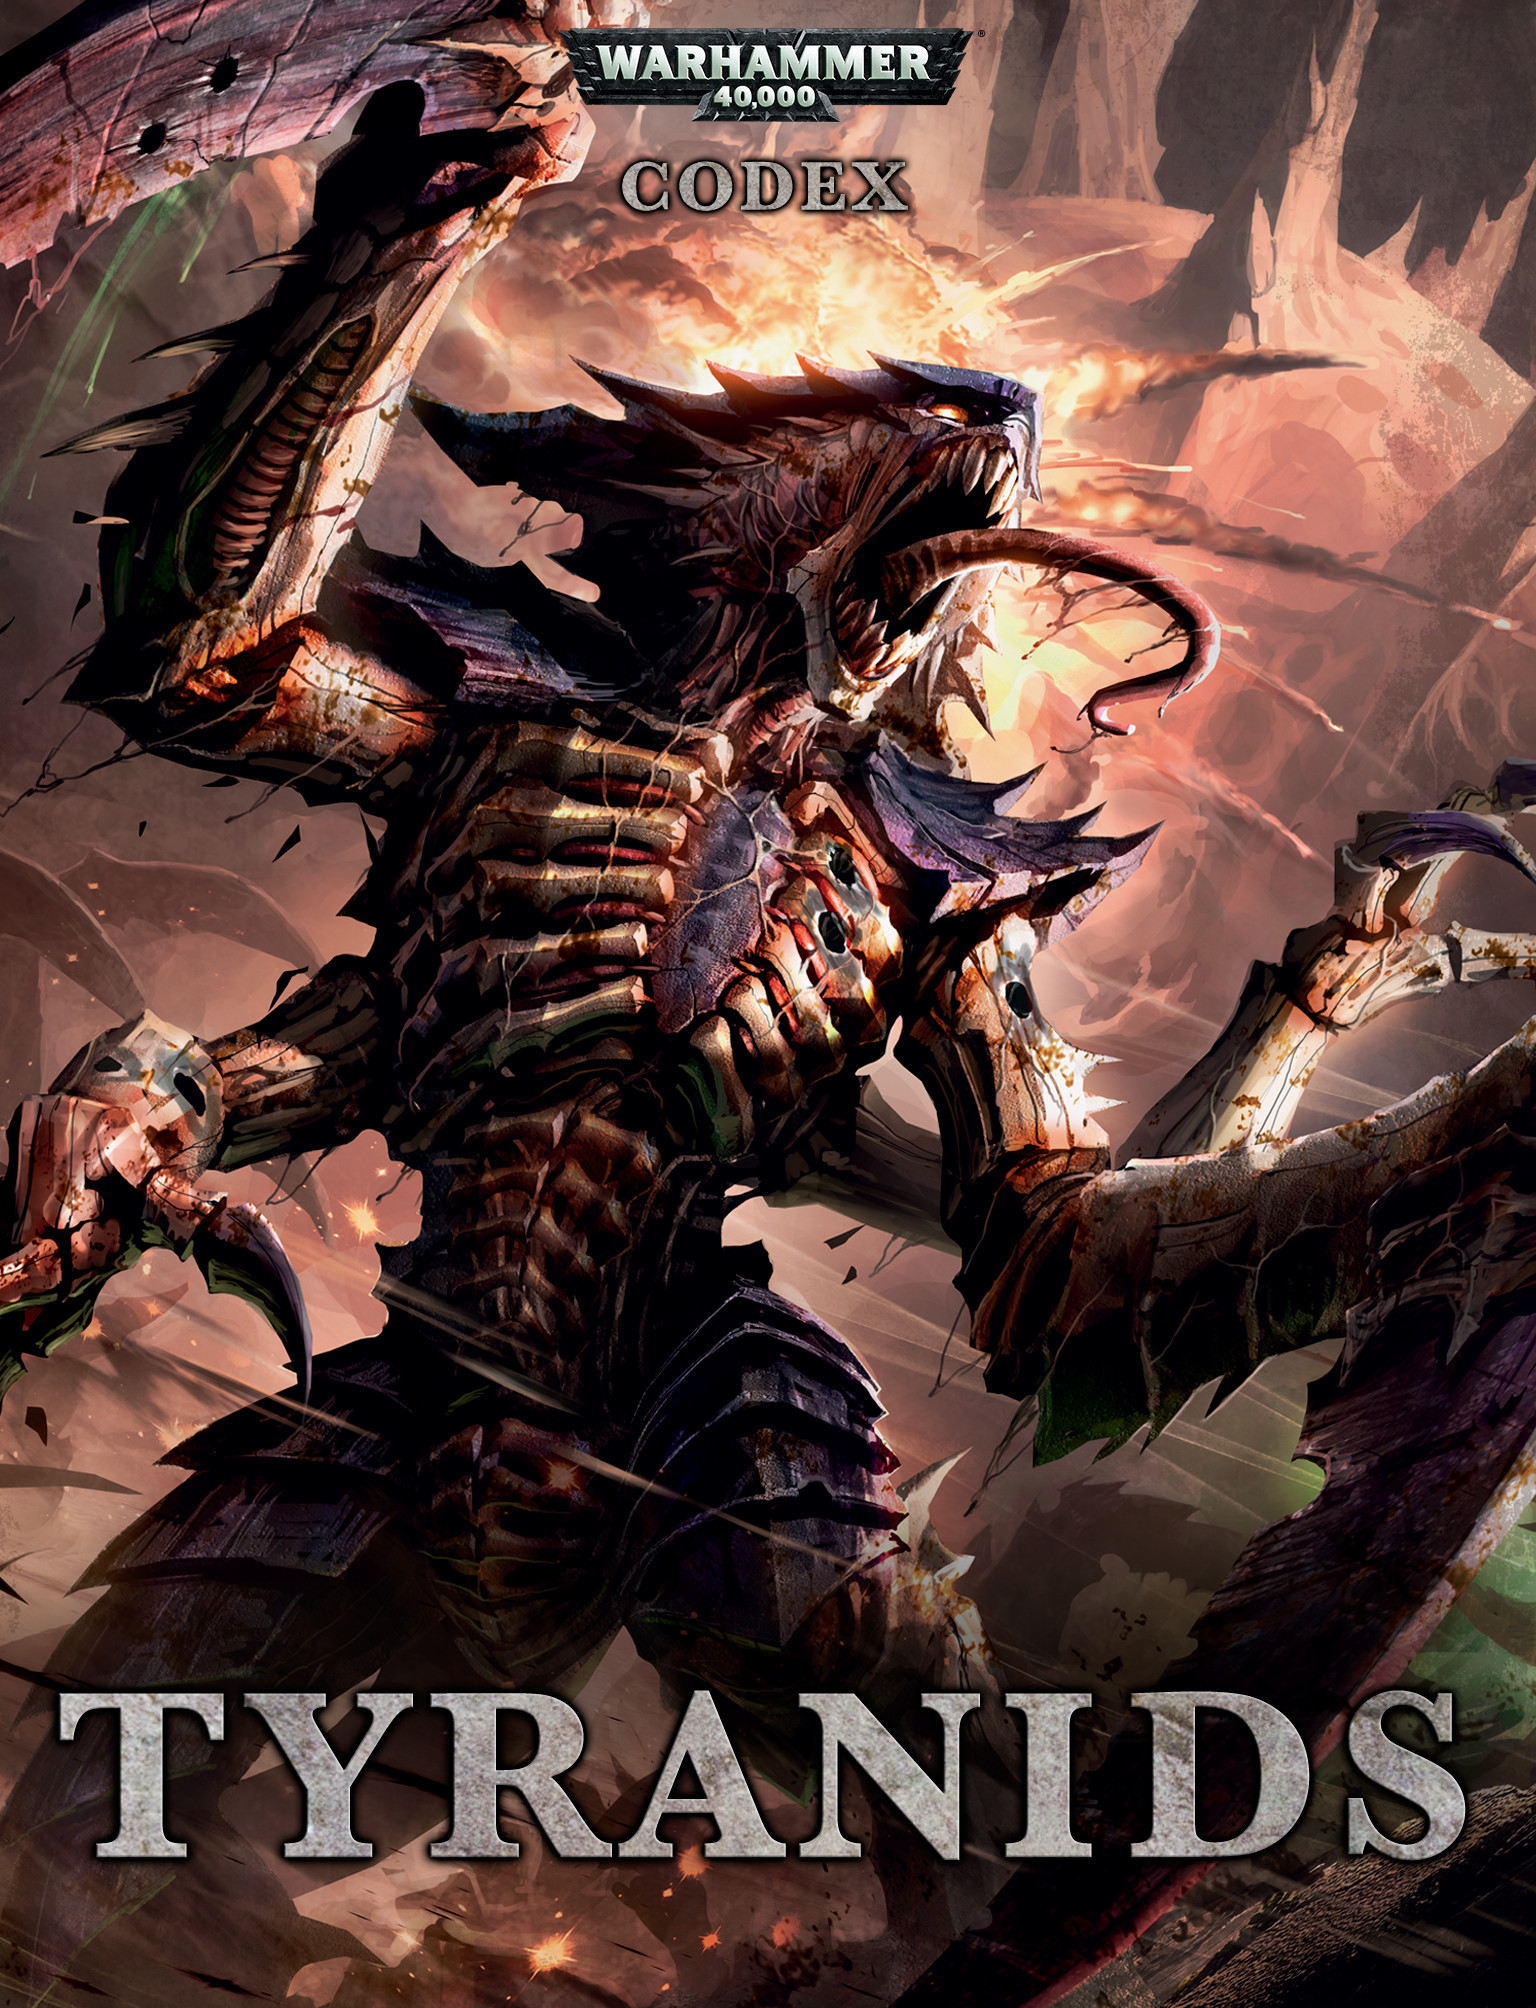 Tyranids Wallpaper Of codex: tyranids.